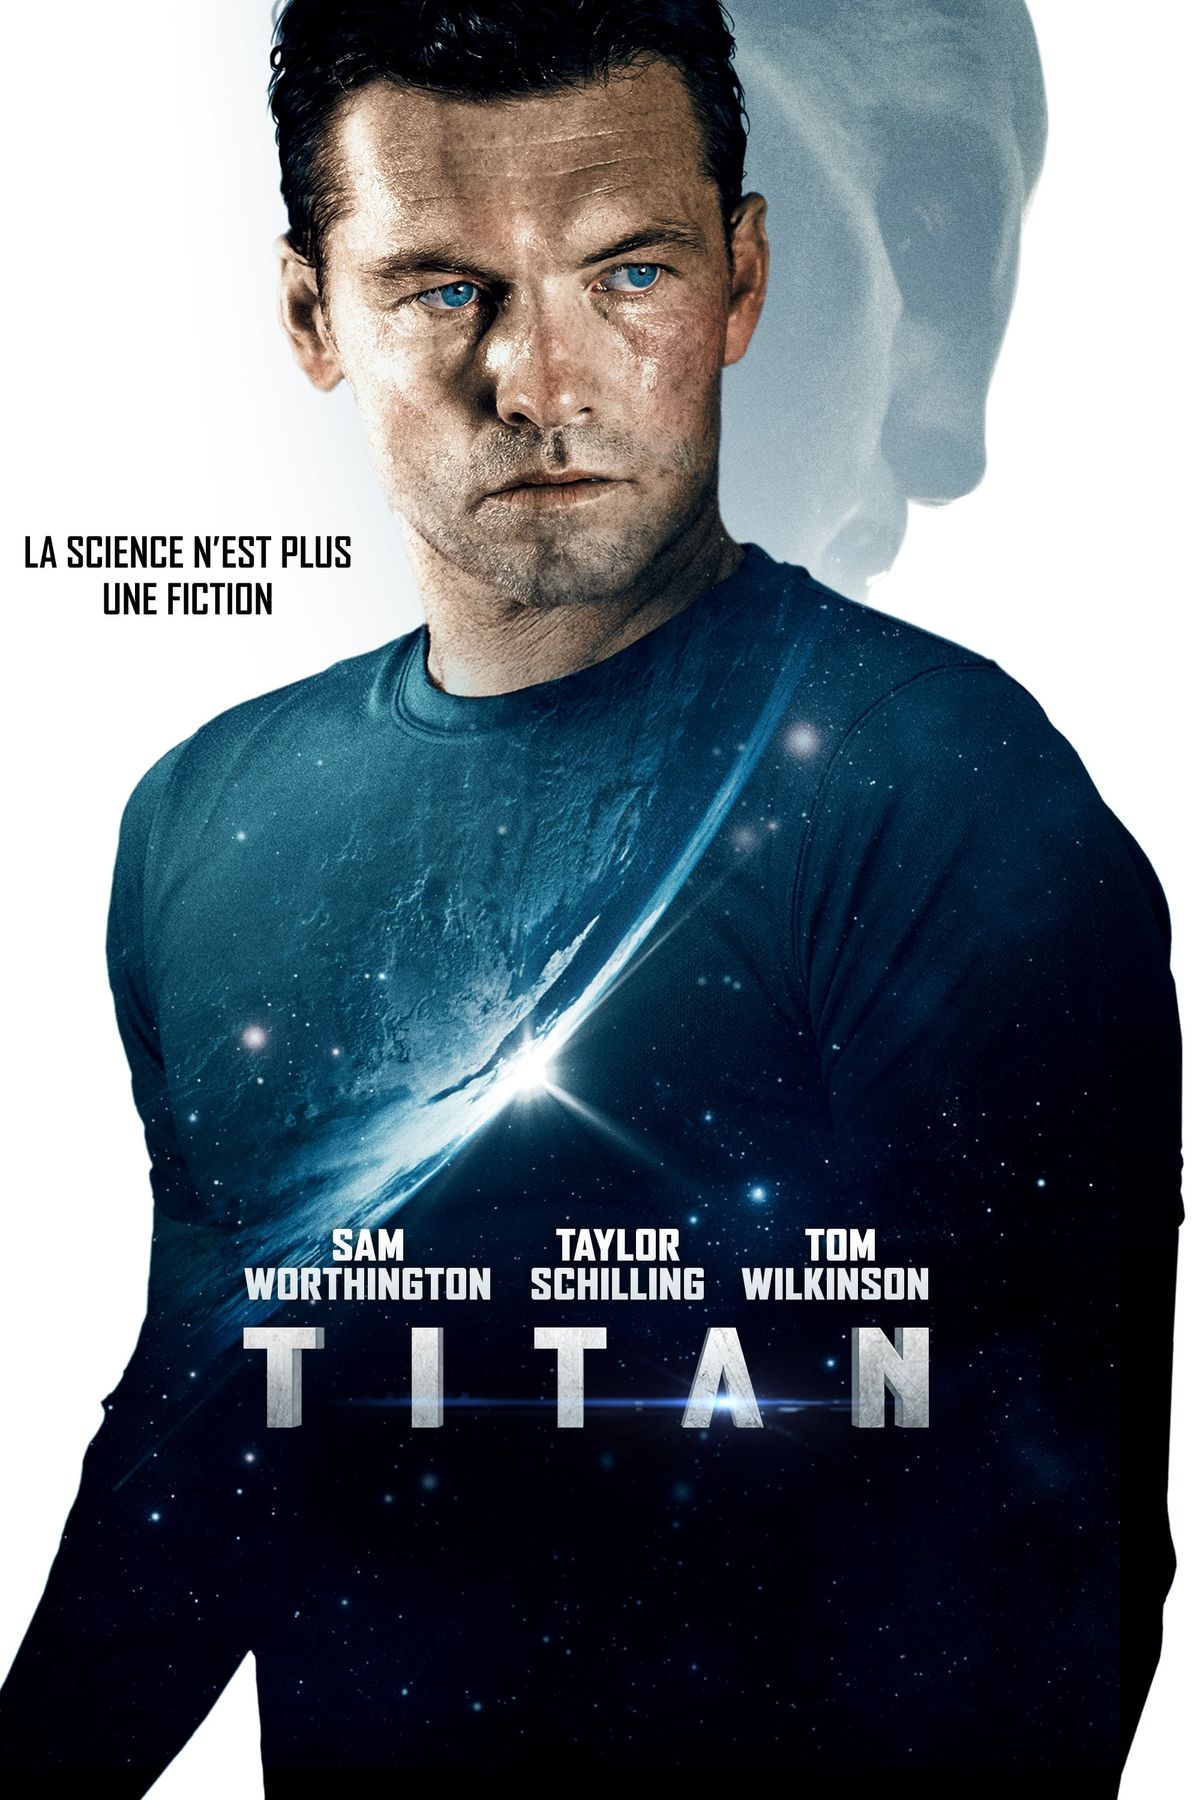 Aaron Heffernan Best Movies, TV Shows and Web Series List